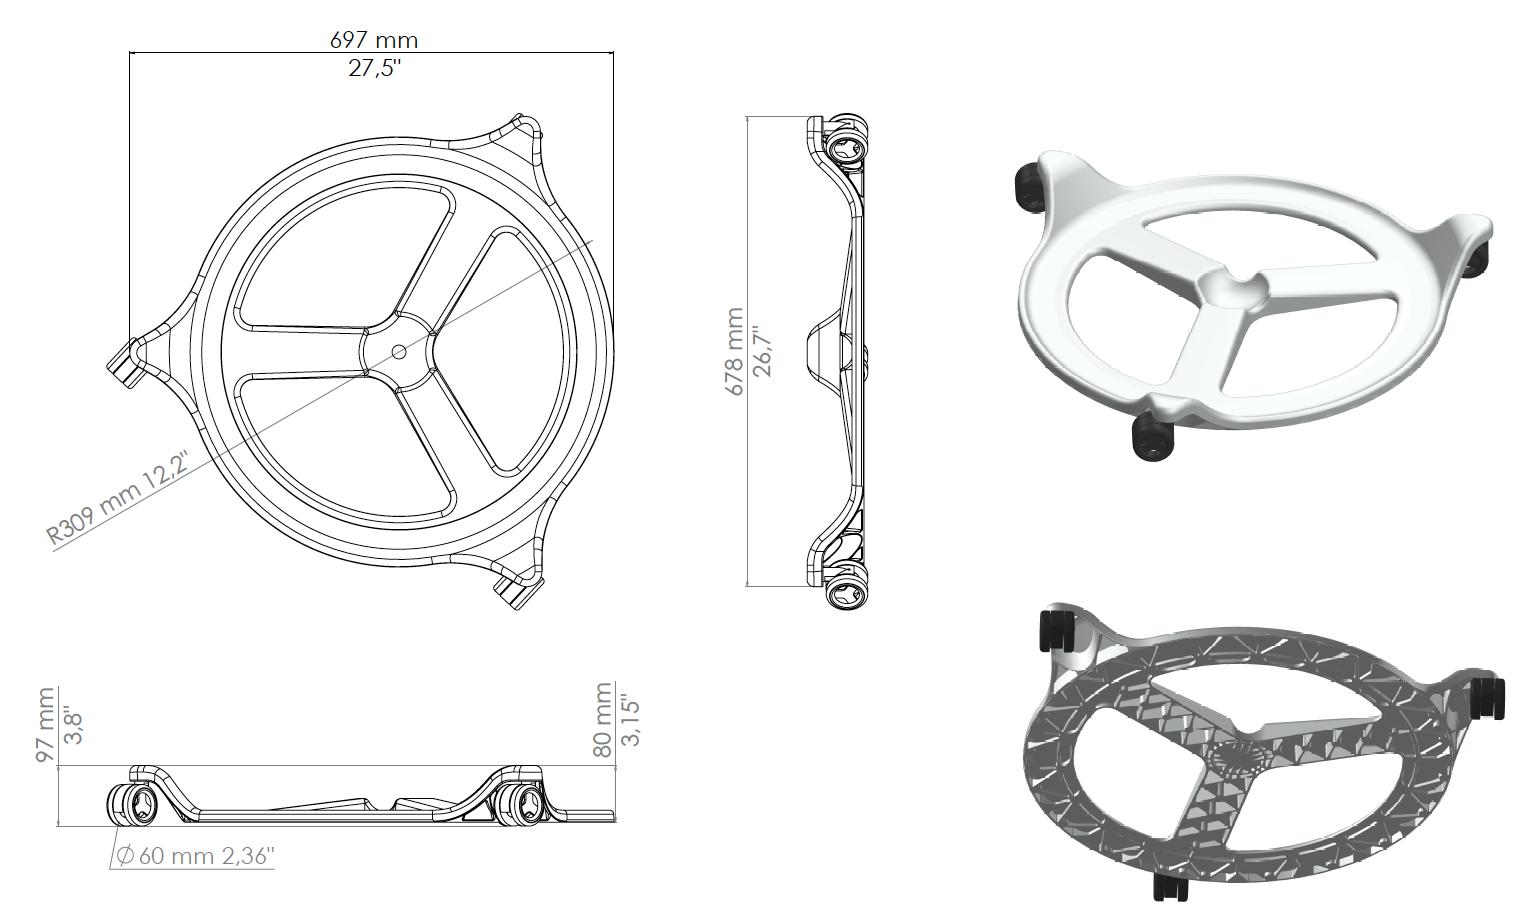 backappwheels-tech.png